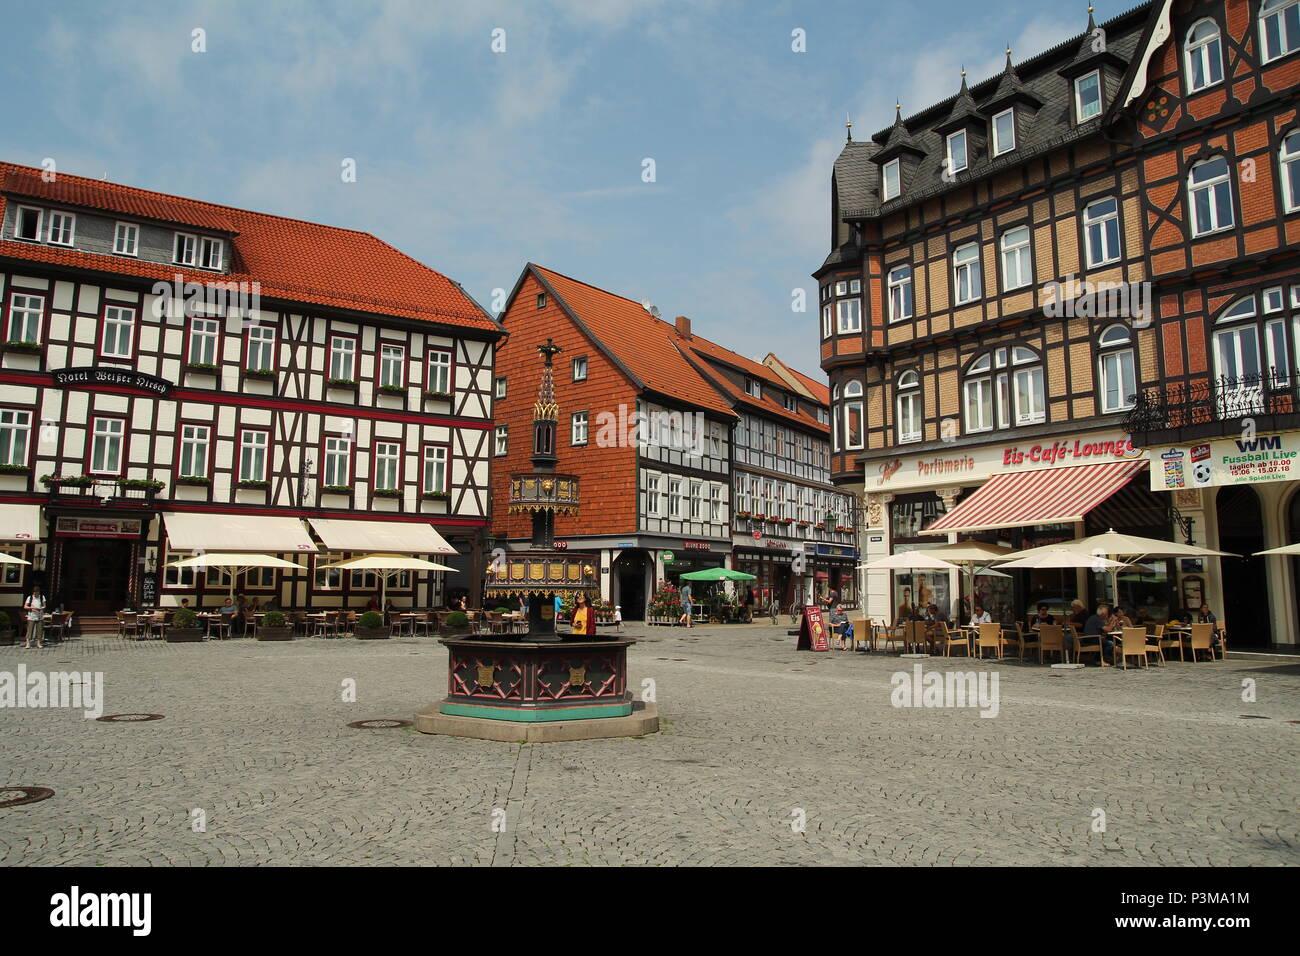 Wernigerode Half-Timbered Houses. Fachwerk. - Stock Image